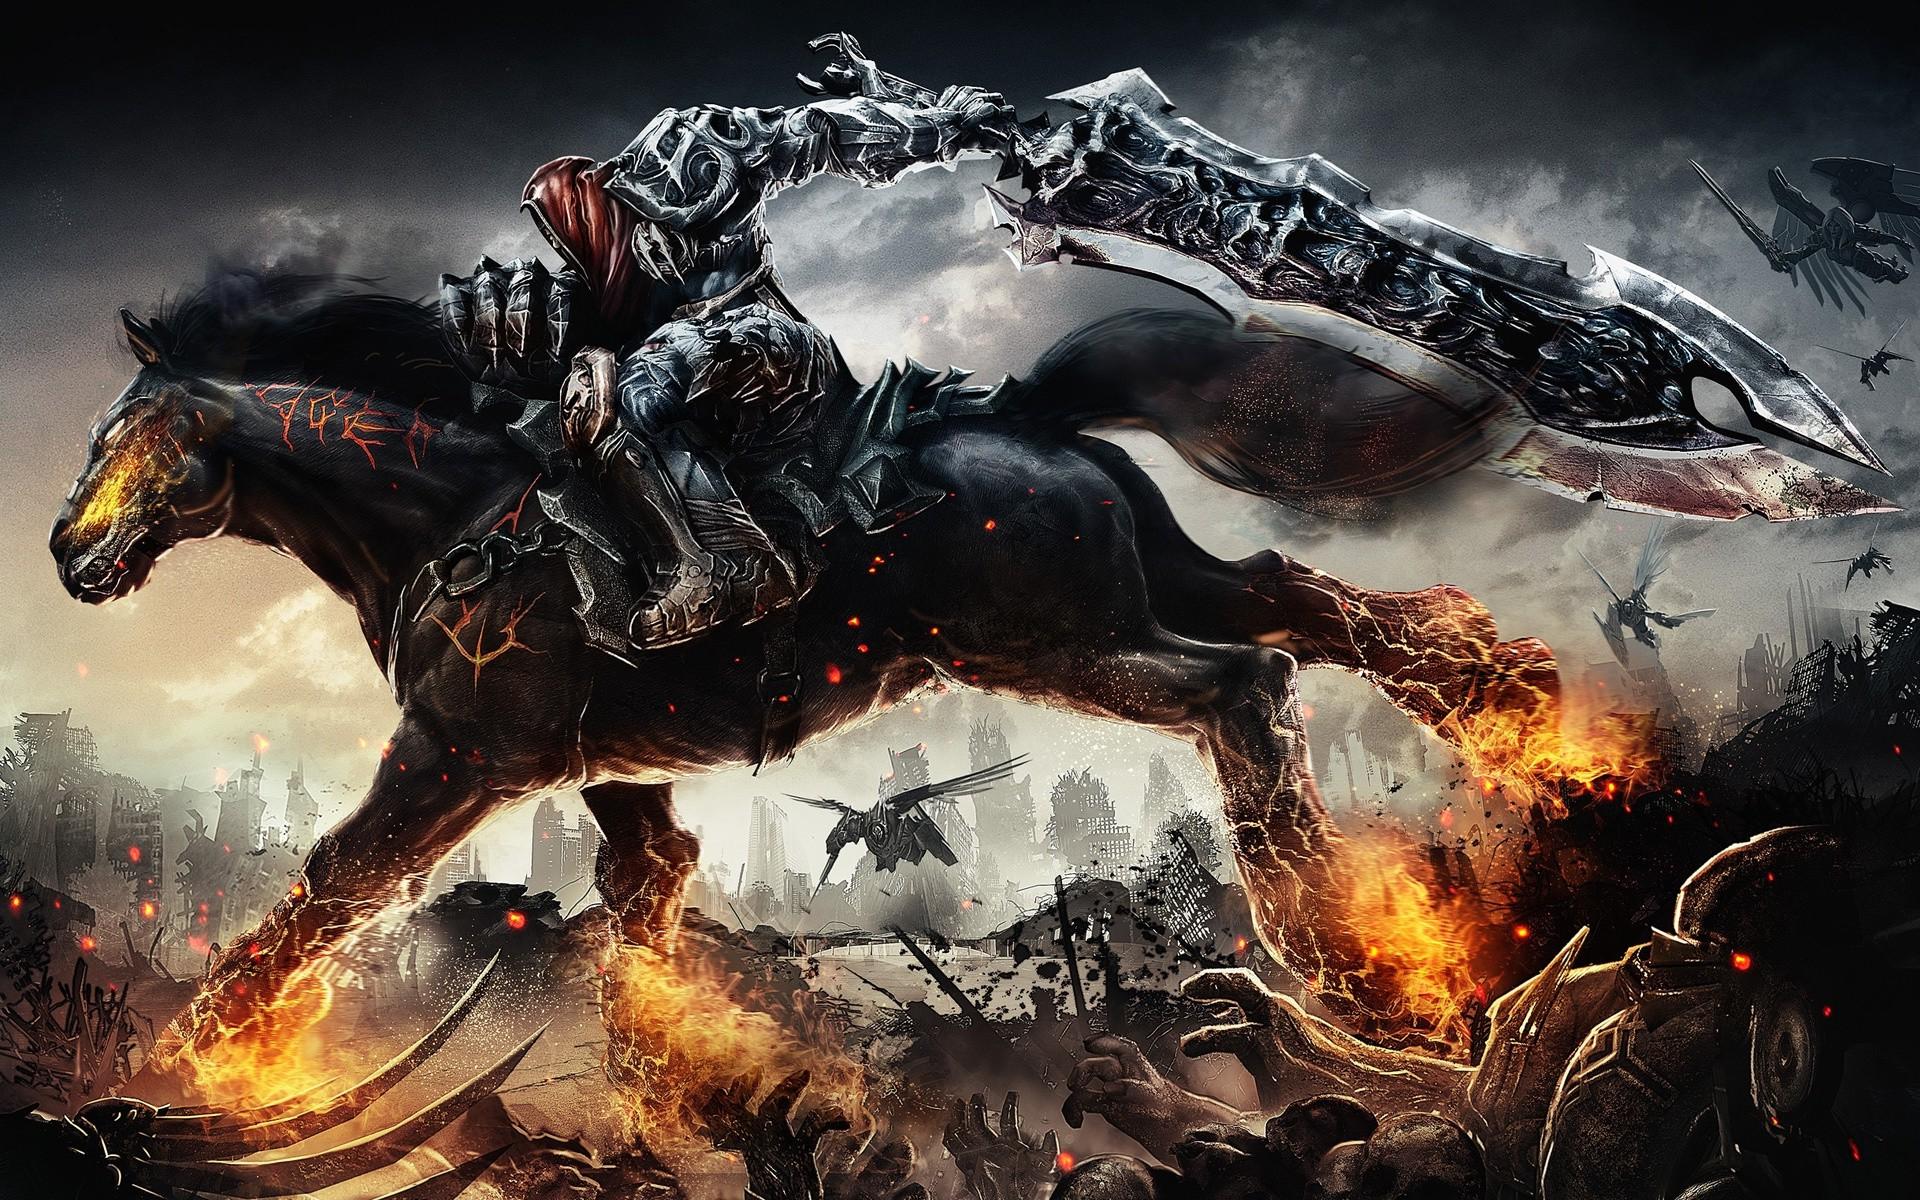 Video Games War World Of Warcraft Mythology Dark Siders Screenshot 1920x1200 Px Computer Wallpaper Fictional Character